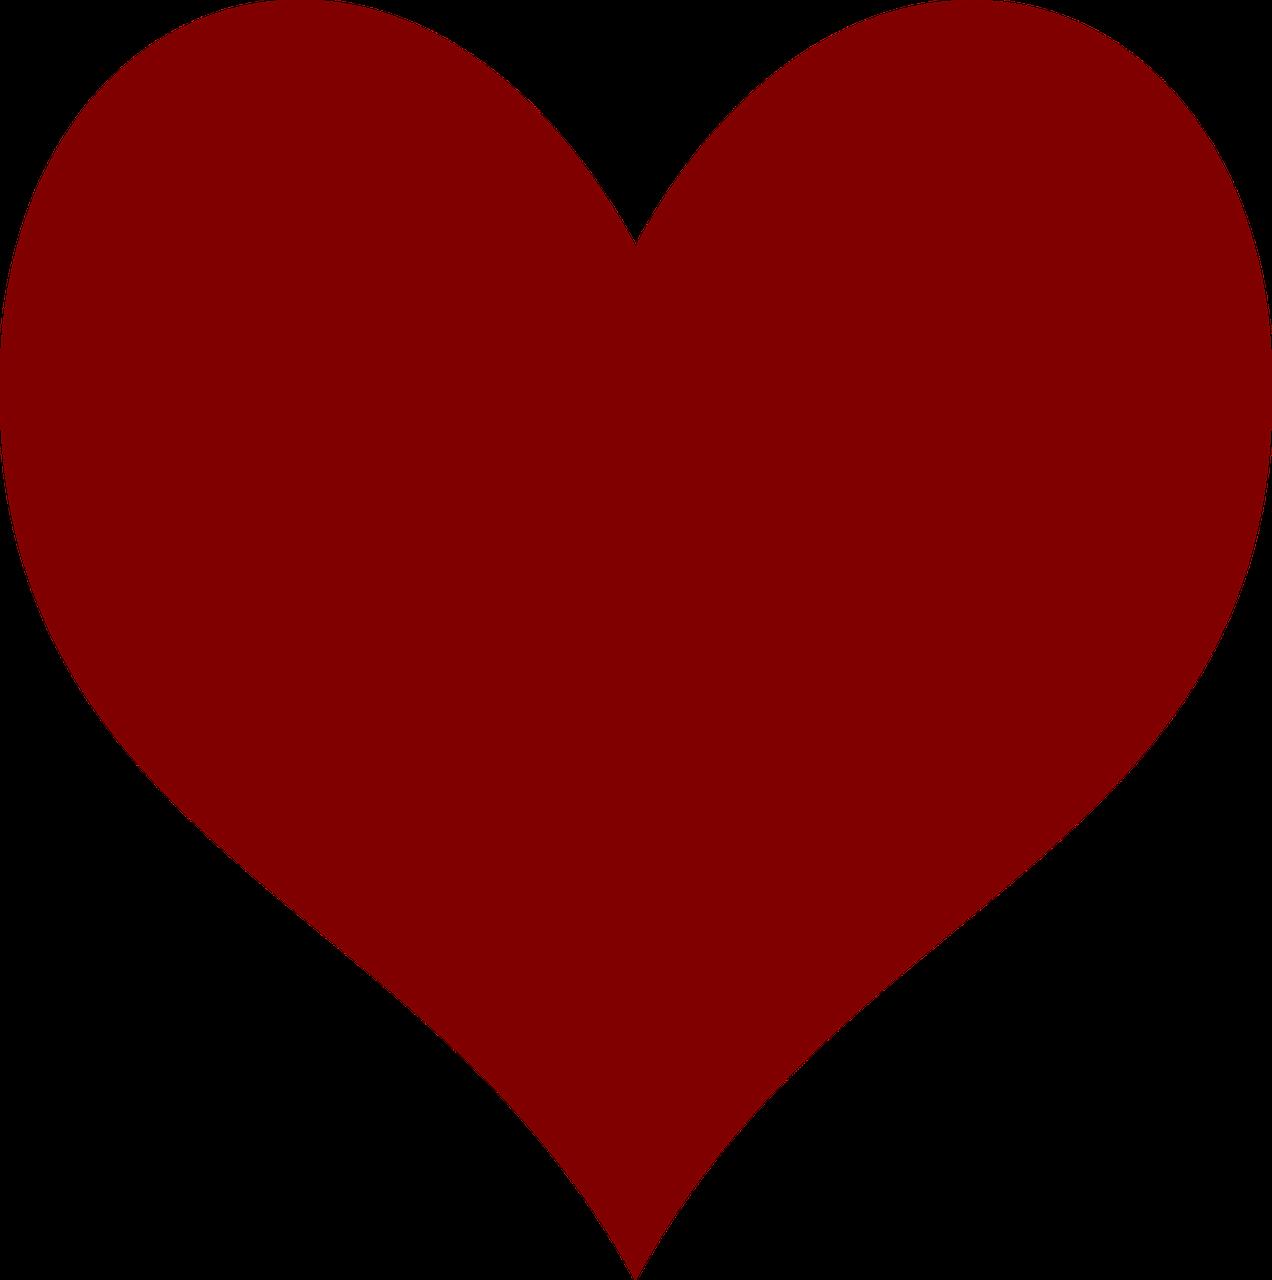 heart-422367_1280